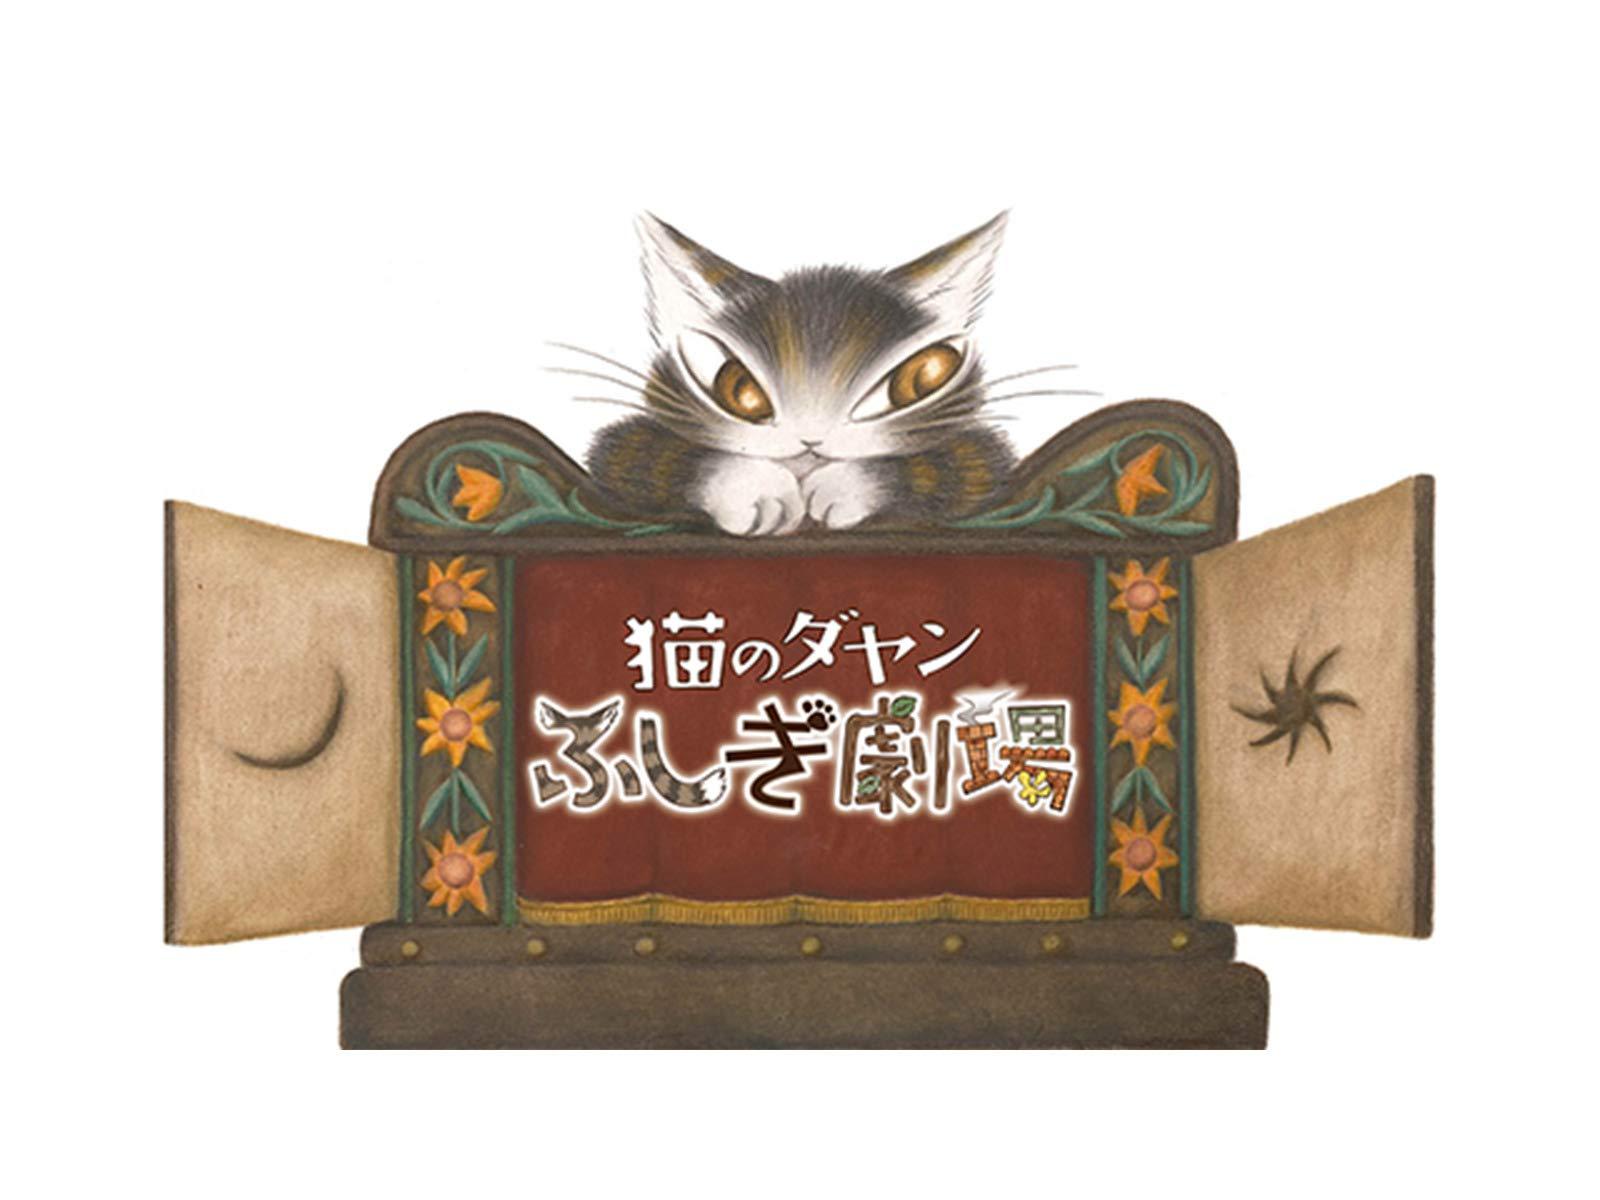 Amazon Co Jp 猫のダヤン ふしぎ劇場を観る Prime Video